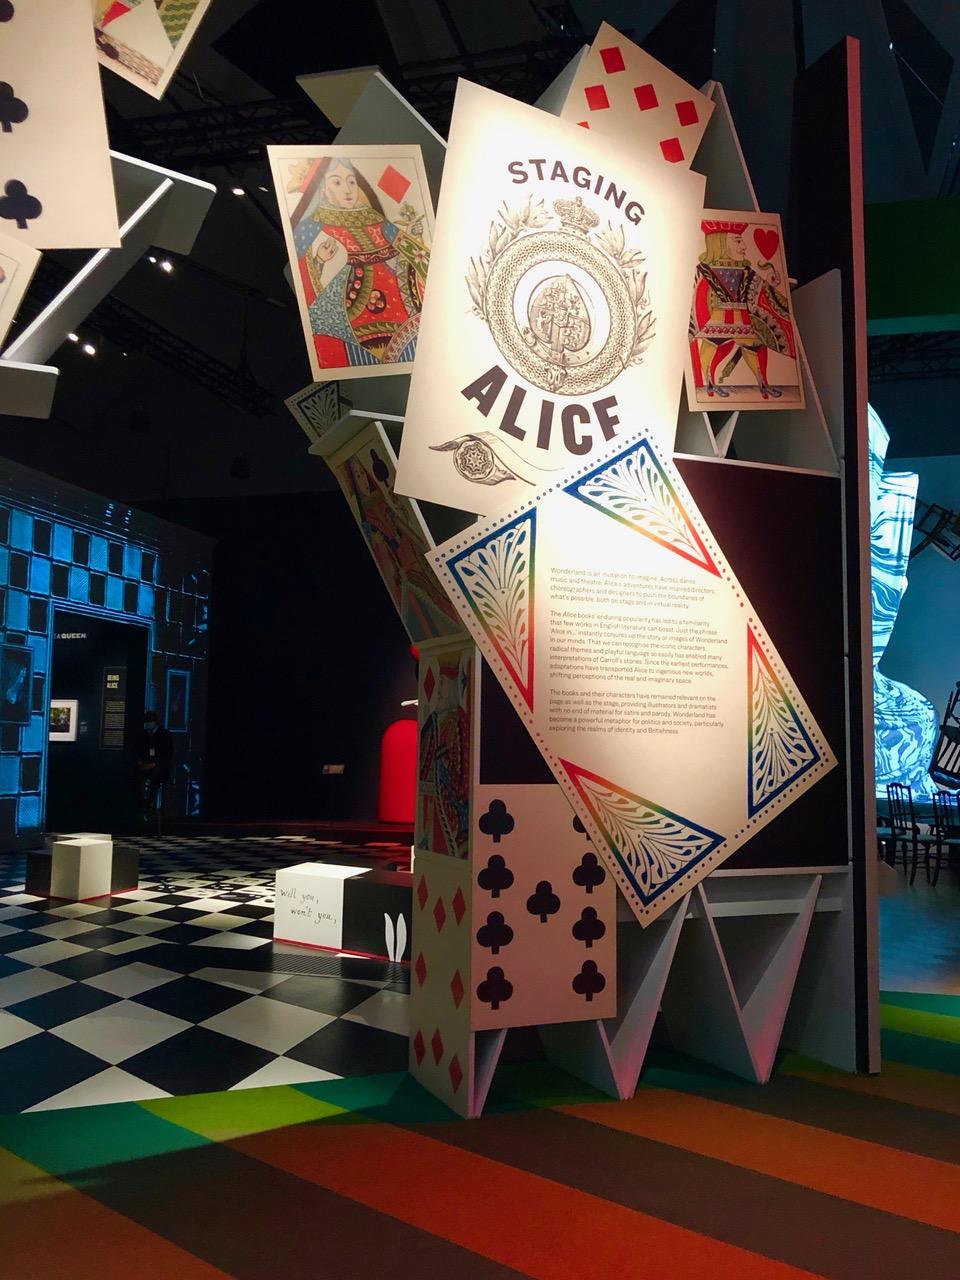 Staging Alice; theatre and musical costume design